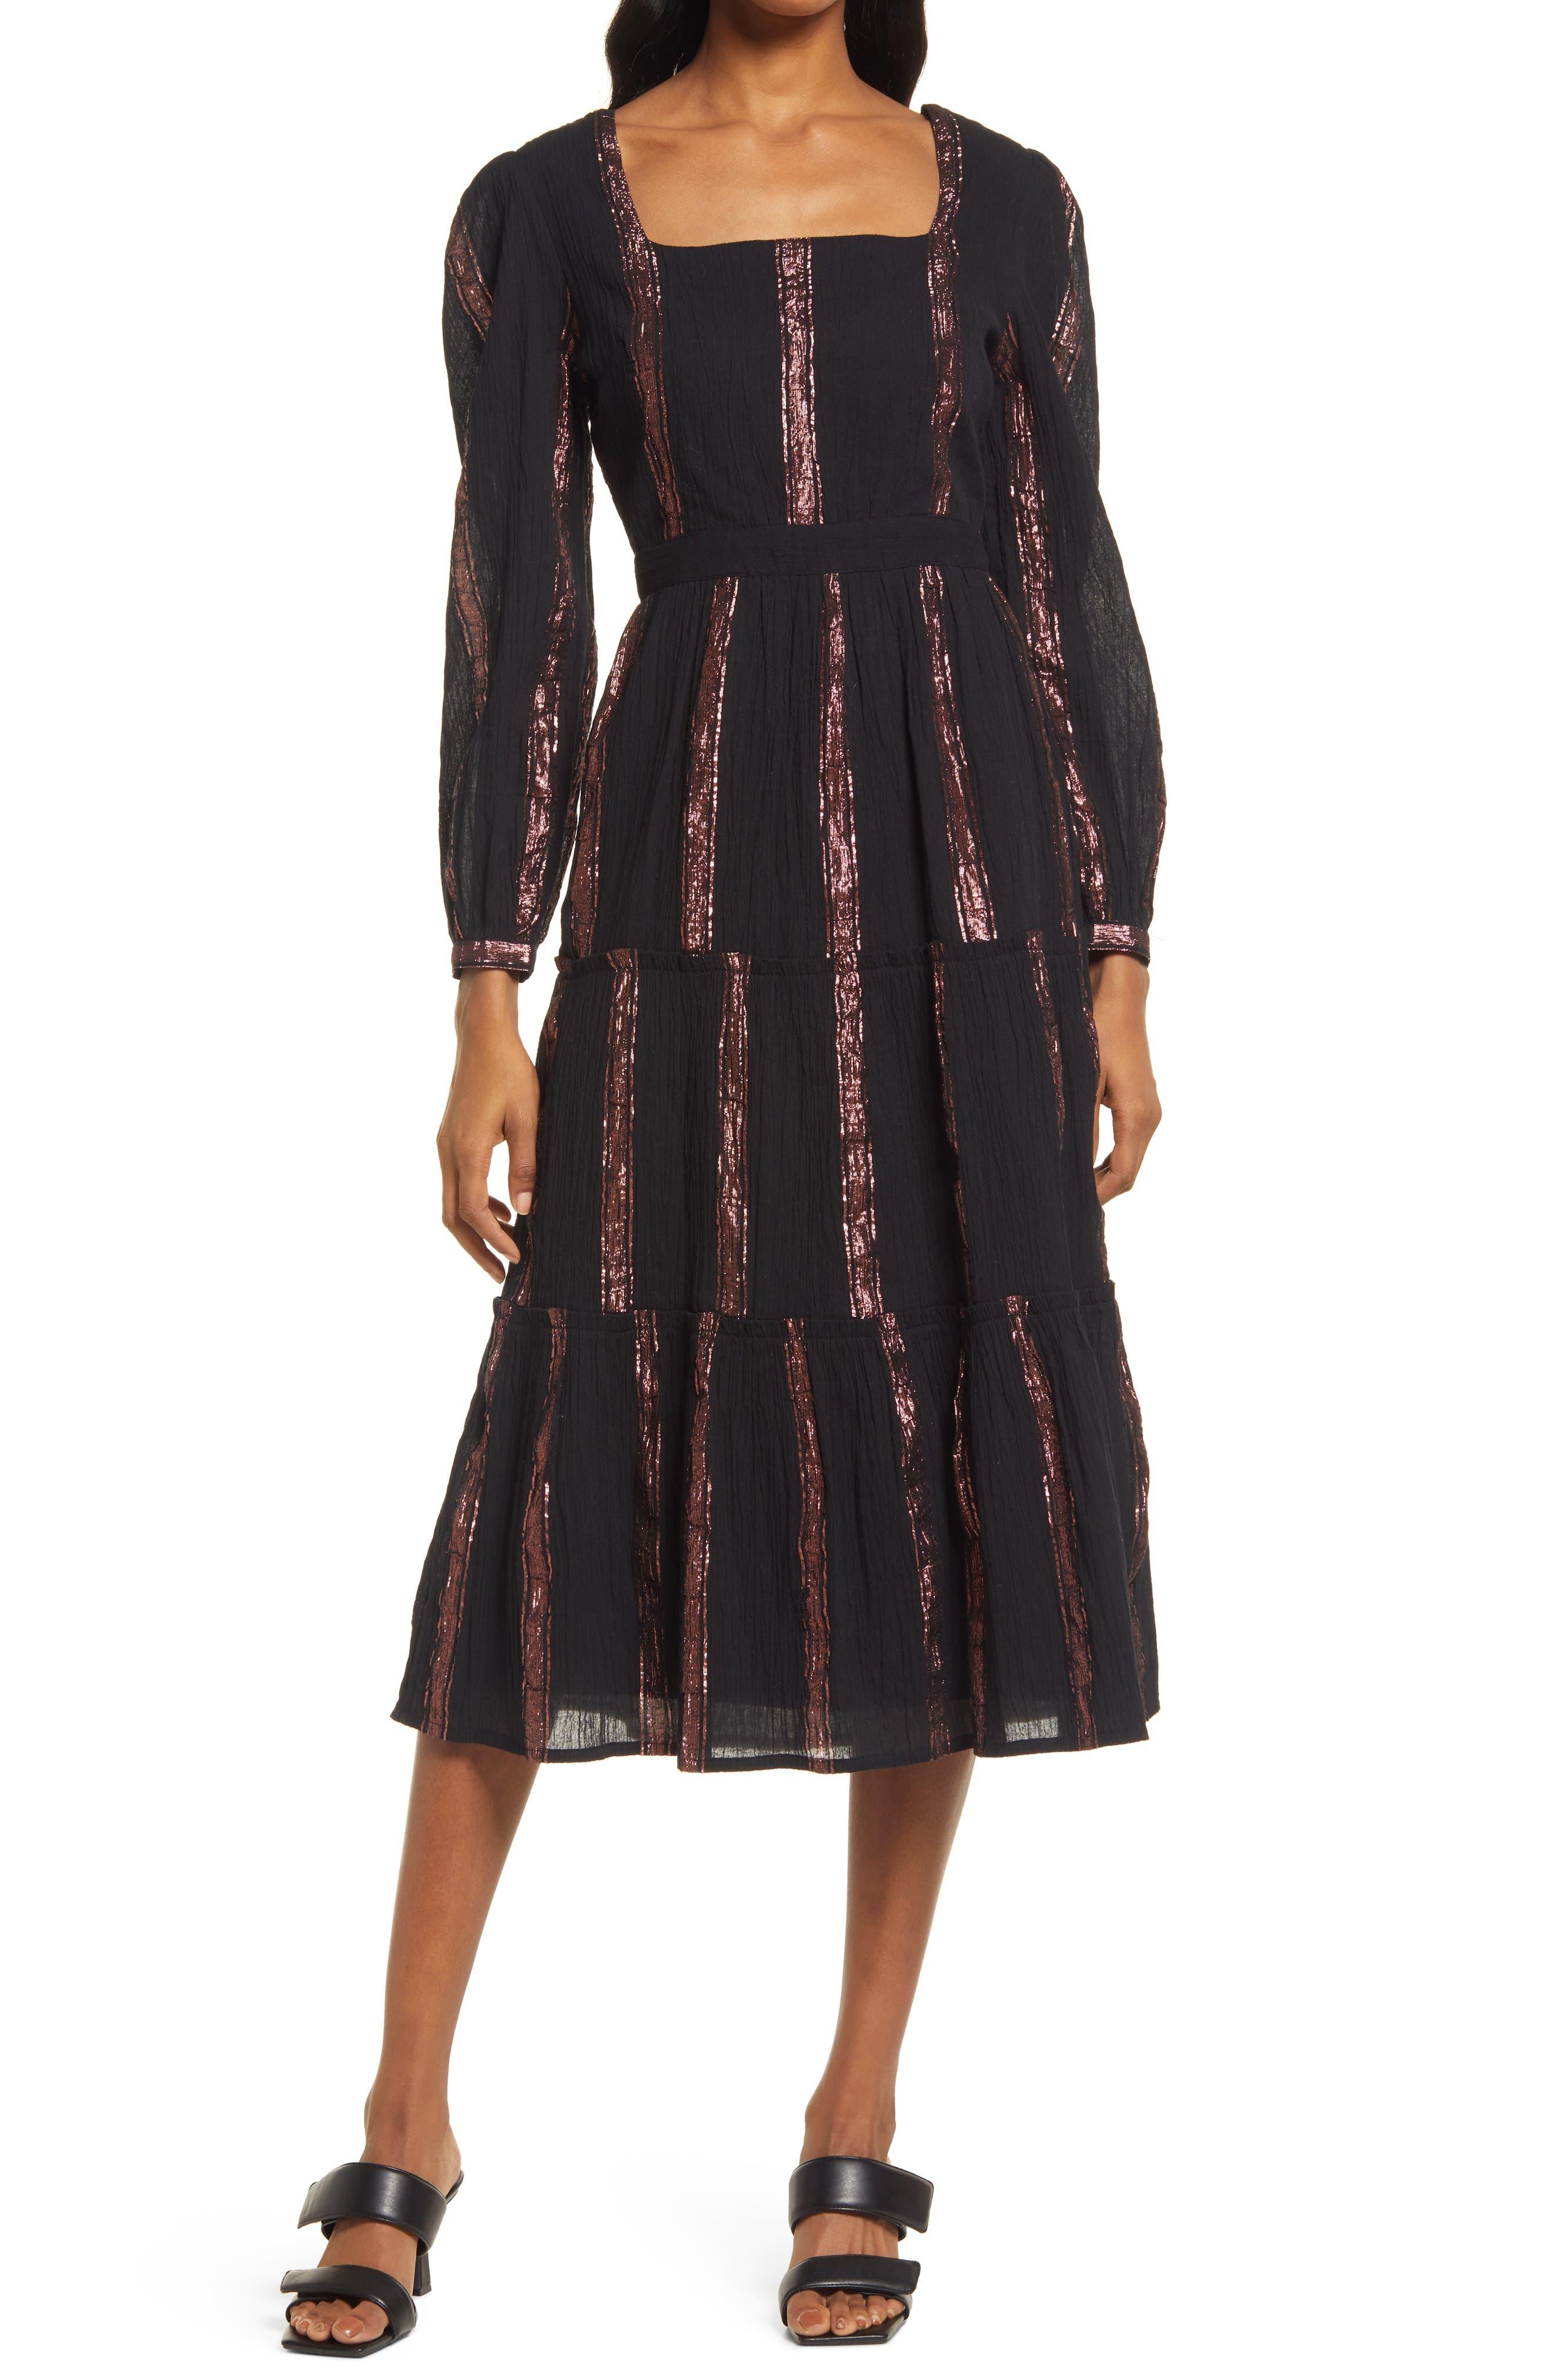 Rihana Metallic Thread Cotton Gauze Long Sleeve Babydoll Dress